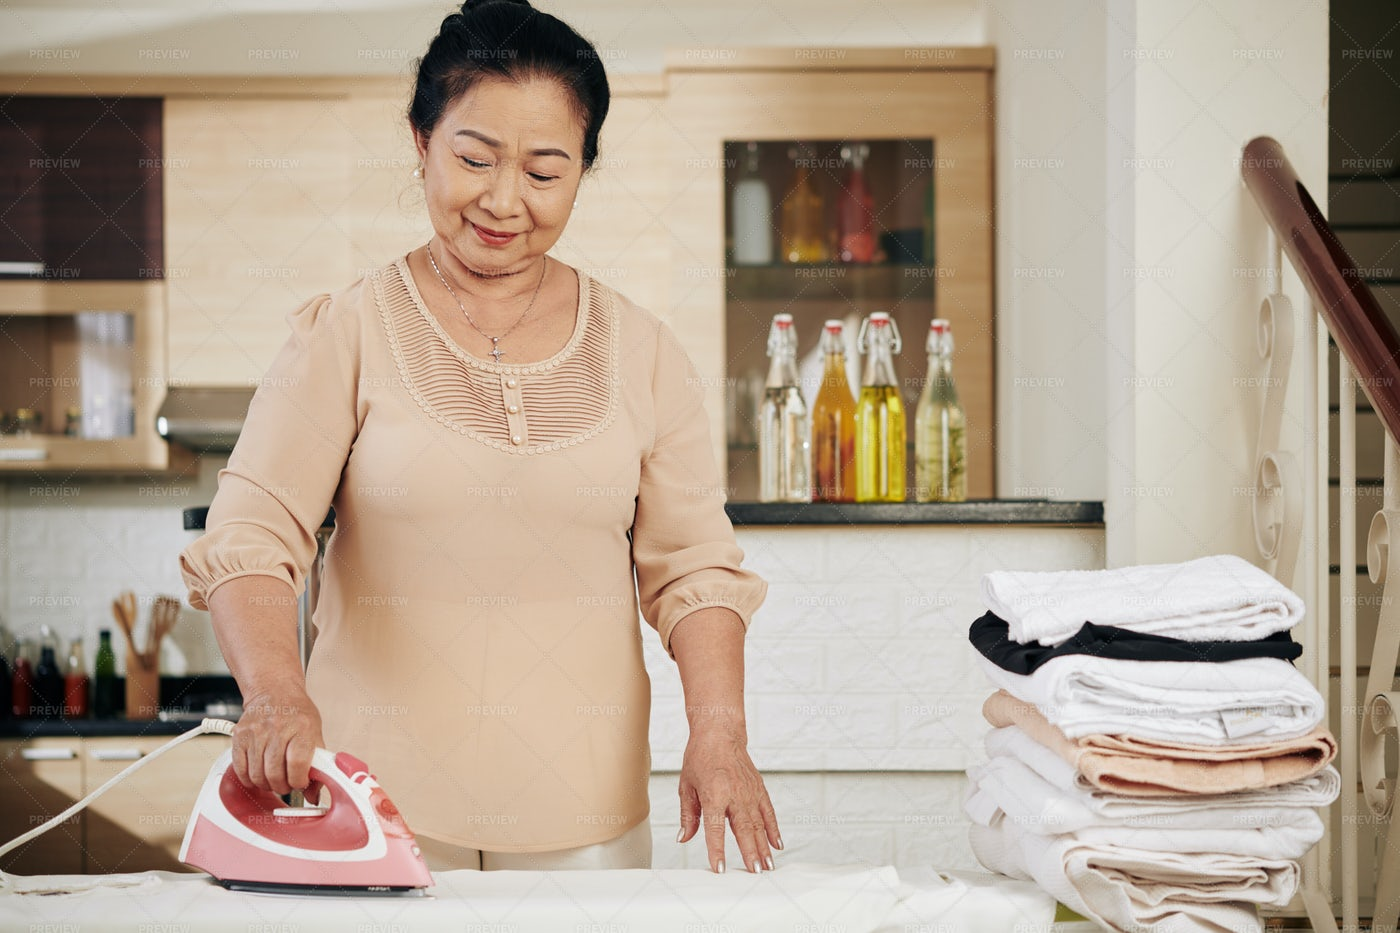 Senior Woman Ironing Towels: Stock Photos